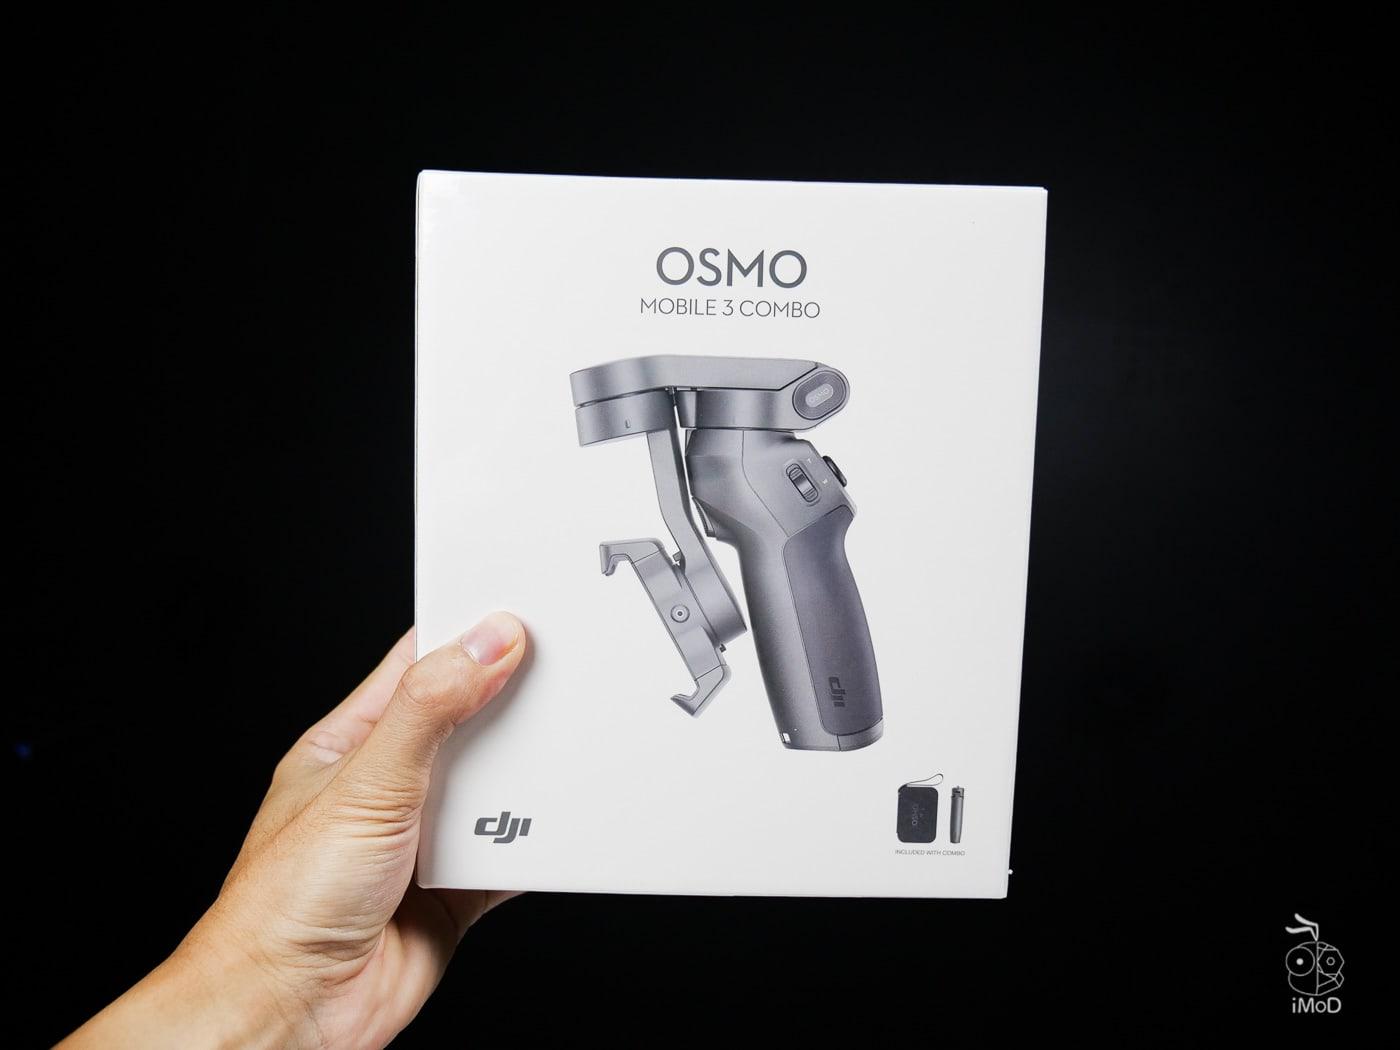 Dji Osmo Mobile 3 Review 1000170